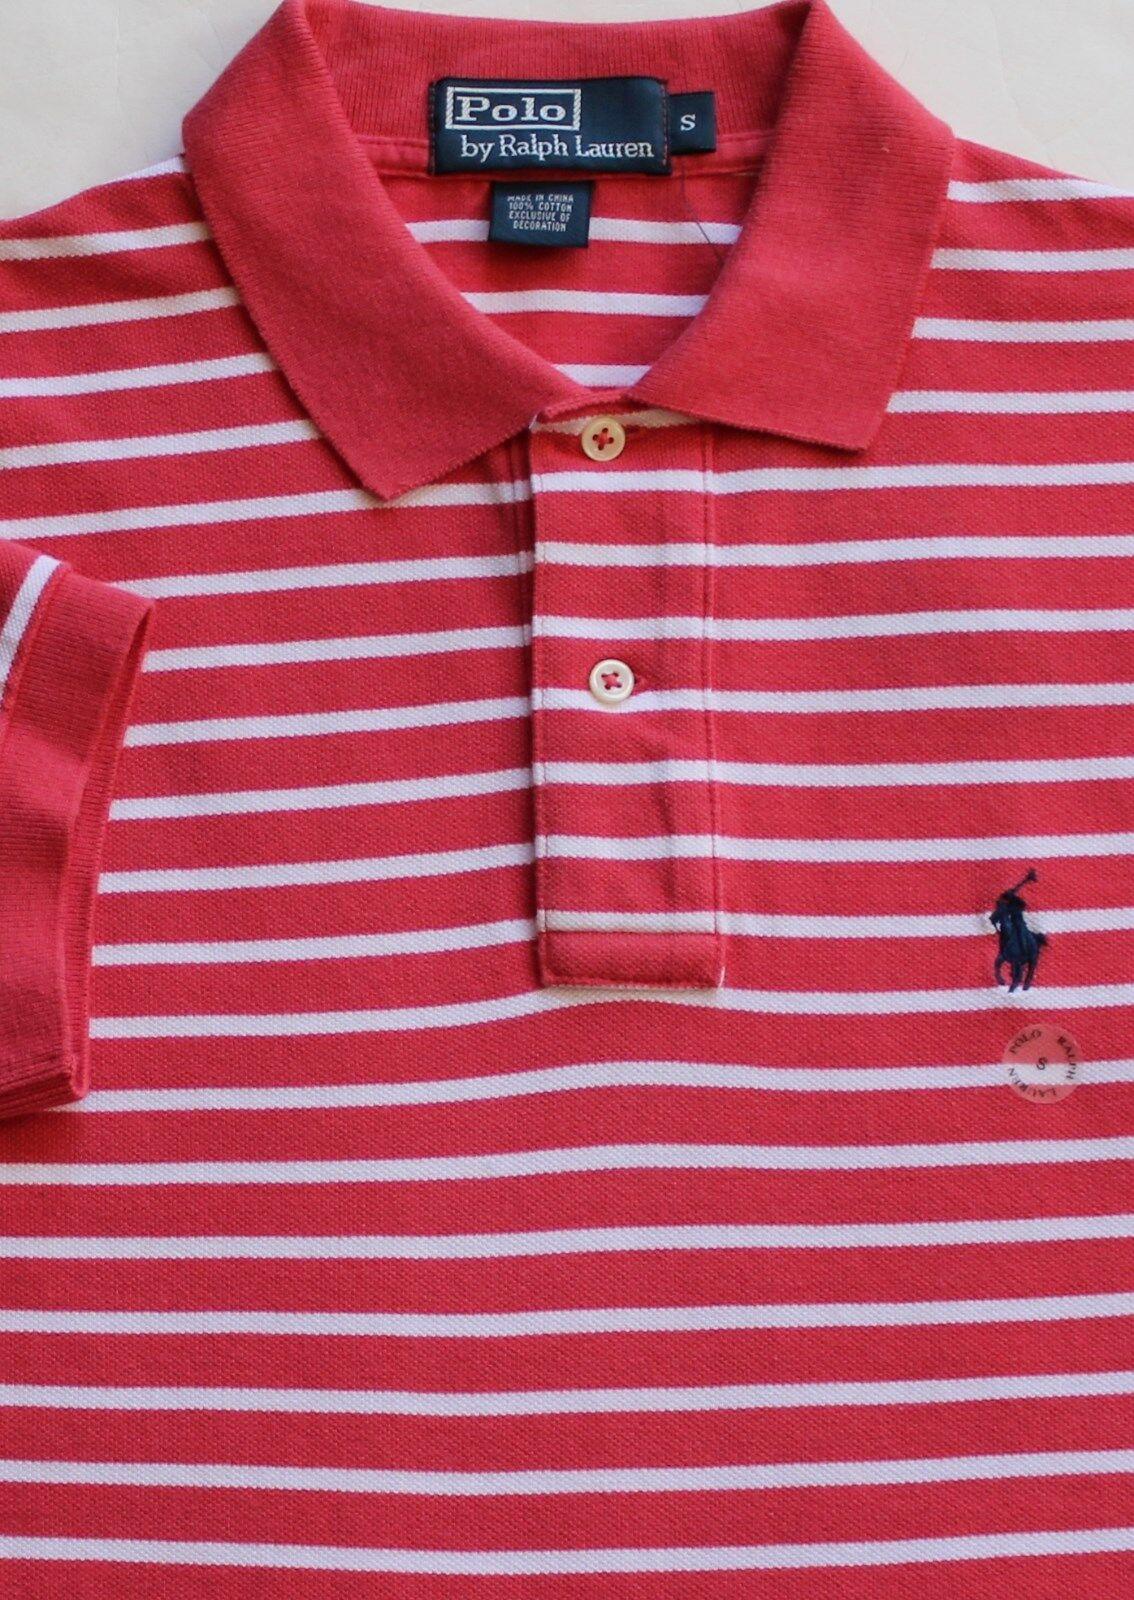 New Polo Ralph Lauren Raspberry Red Striped Cotton Mesh Polo Shirt   Medium